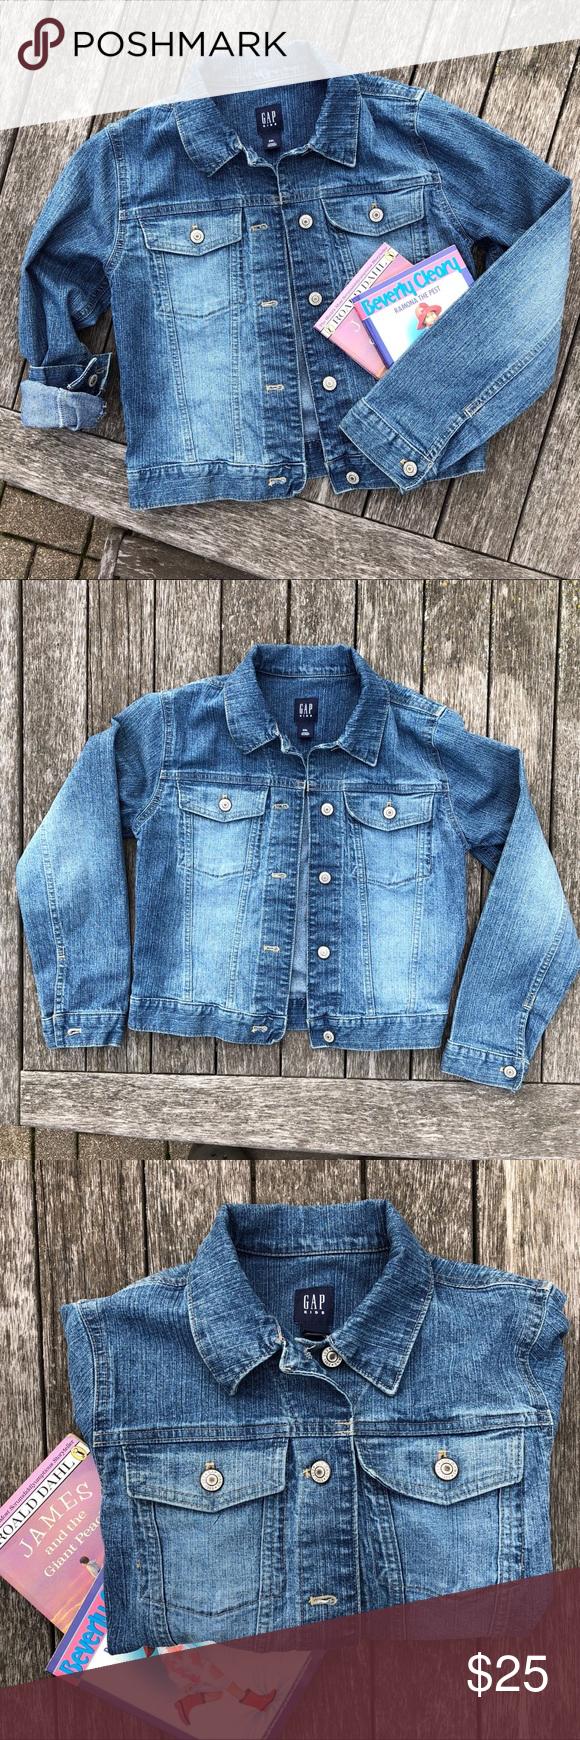 Gap Kids Xxl Jean Jacket Kids Jeans Jacket Clothes Design Fashion [ 1740 x 580 Pixel ]